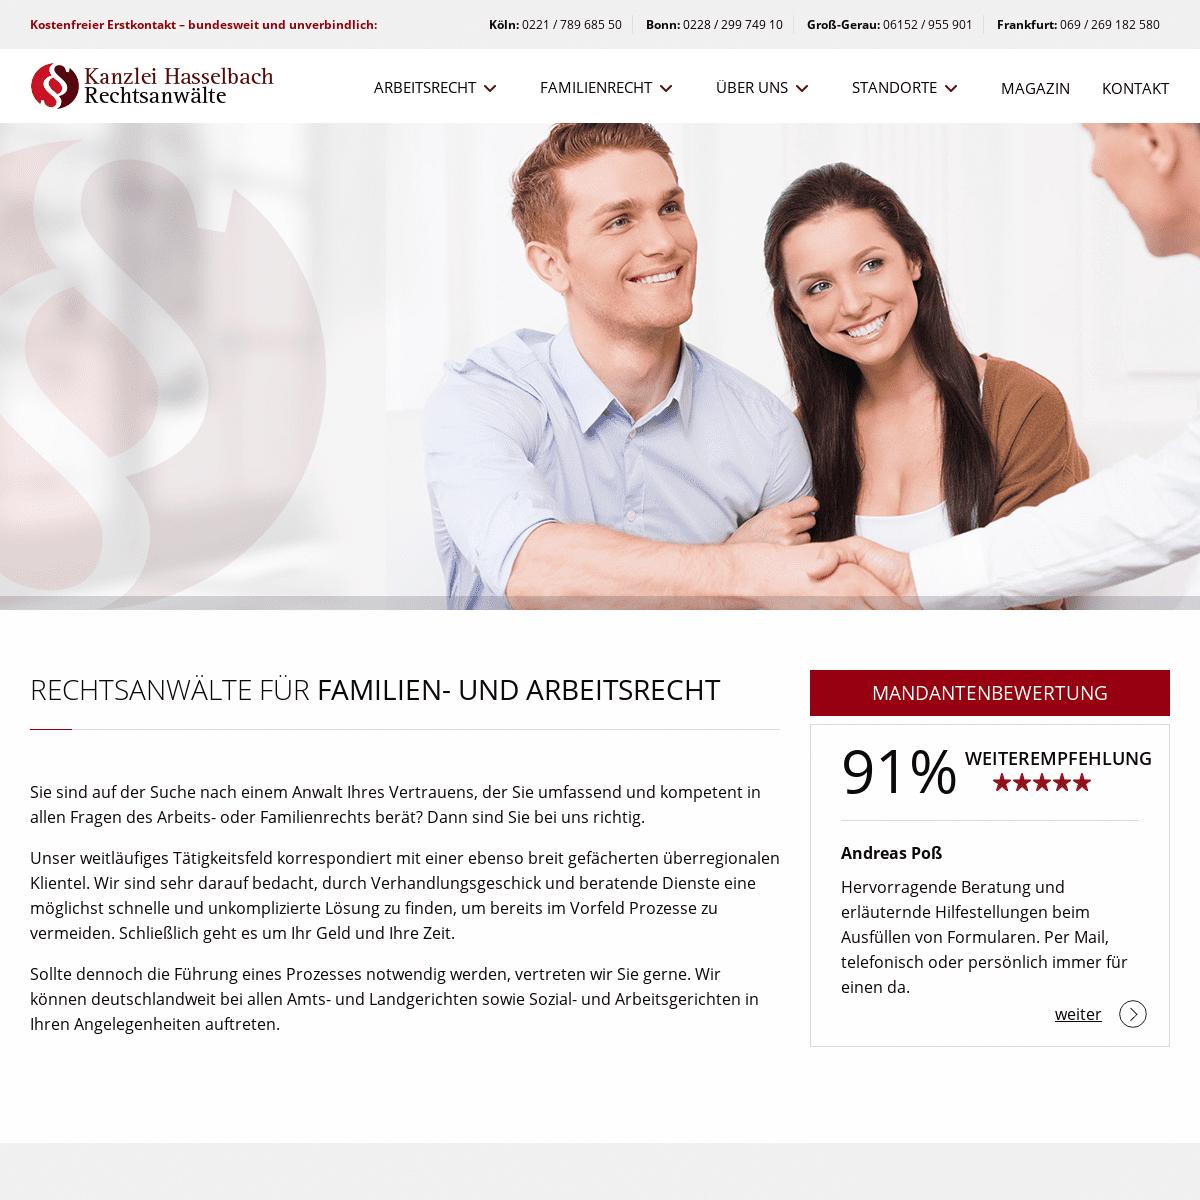 Rechtsanwalt für Familienrecht und Arbeitsrecht - Kanzlei Hasselbach